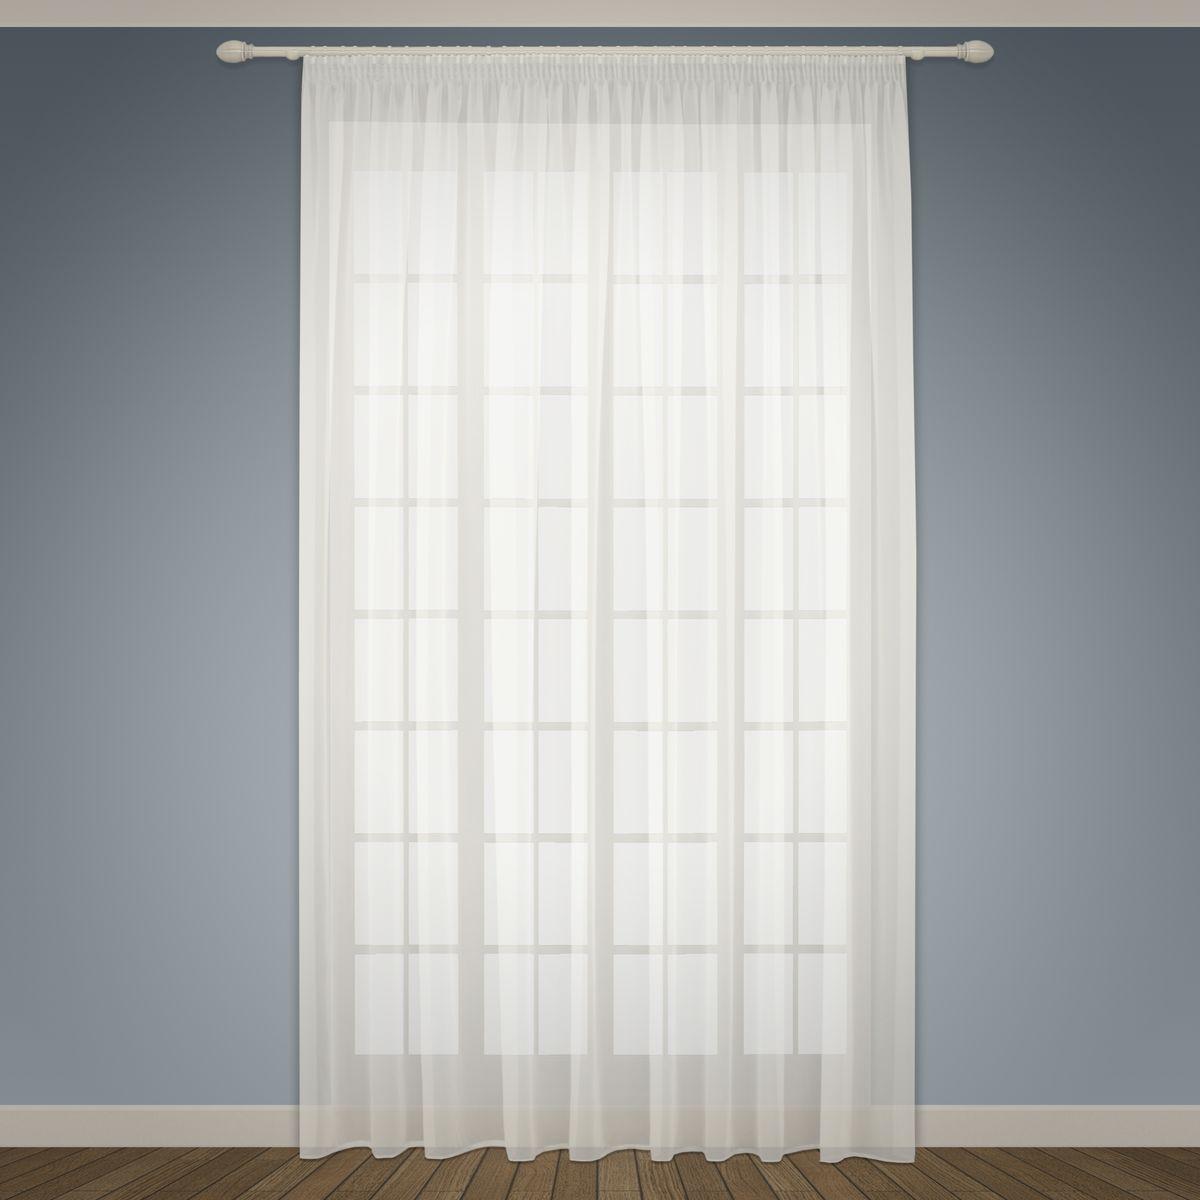 Тюль Sanpa Home Collection Аманда, на ленте, цвет: белый, высота 260 смHP vual/1585/1E Аманда белый, , 300*260 см